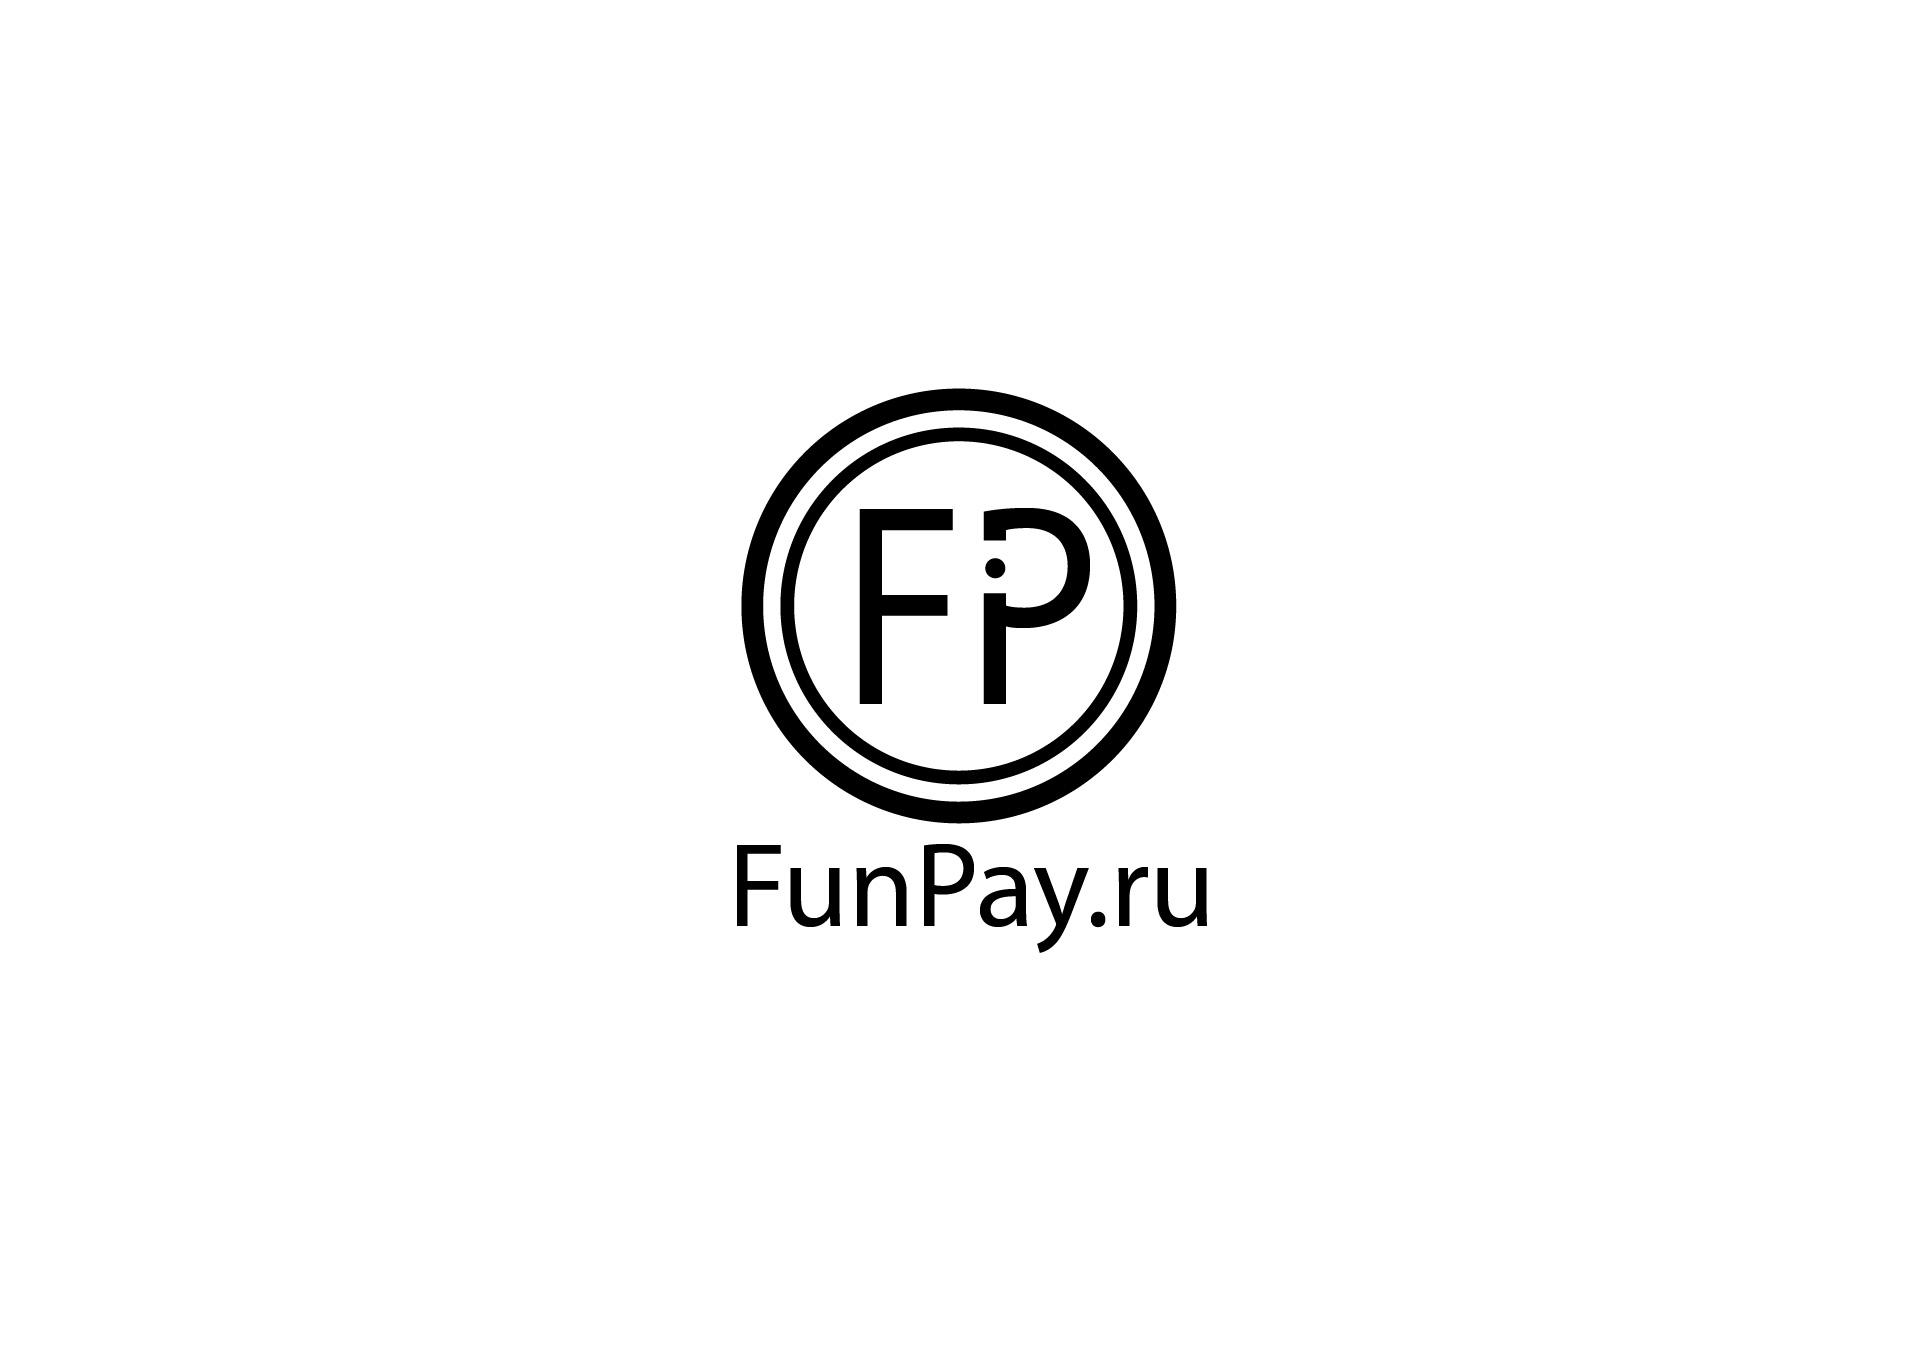 Логотип для FunPay.ru фото f_5065991b217e2956.jpg